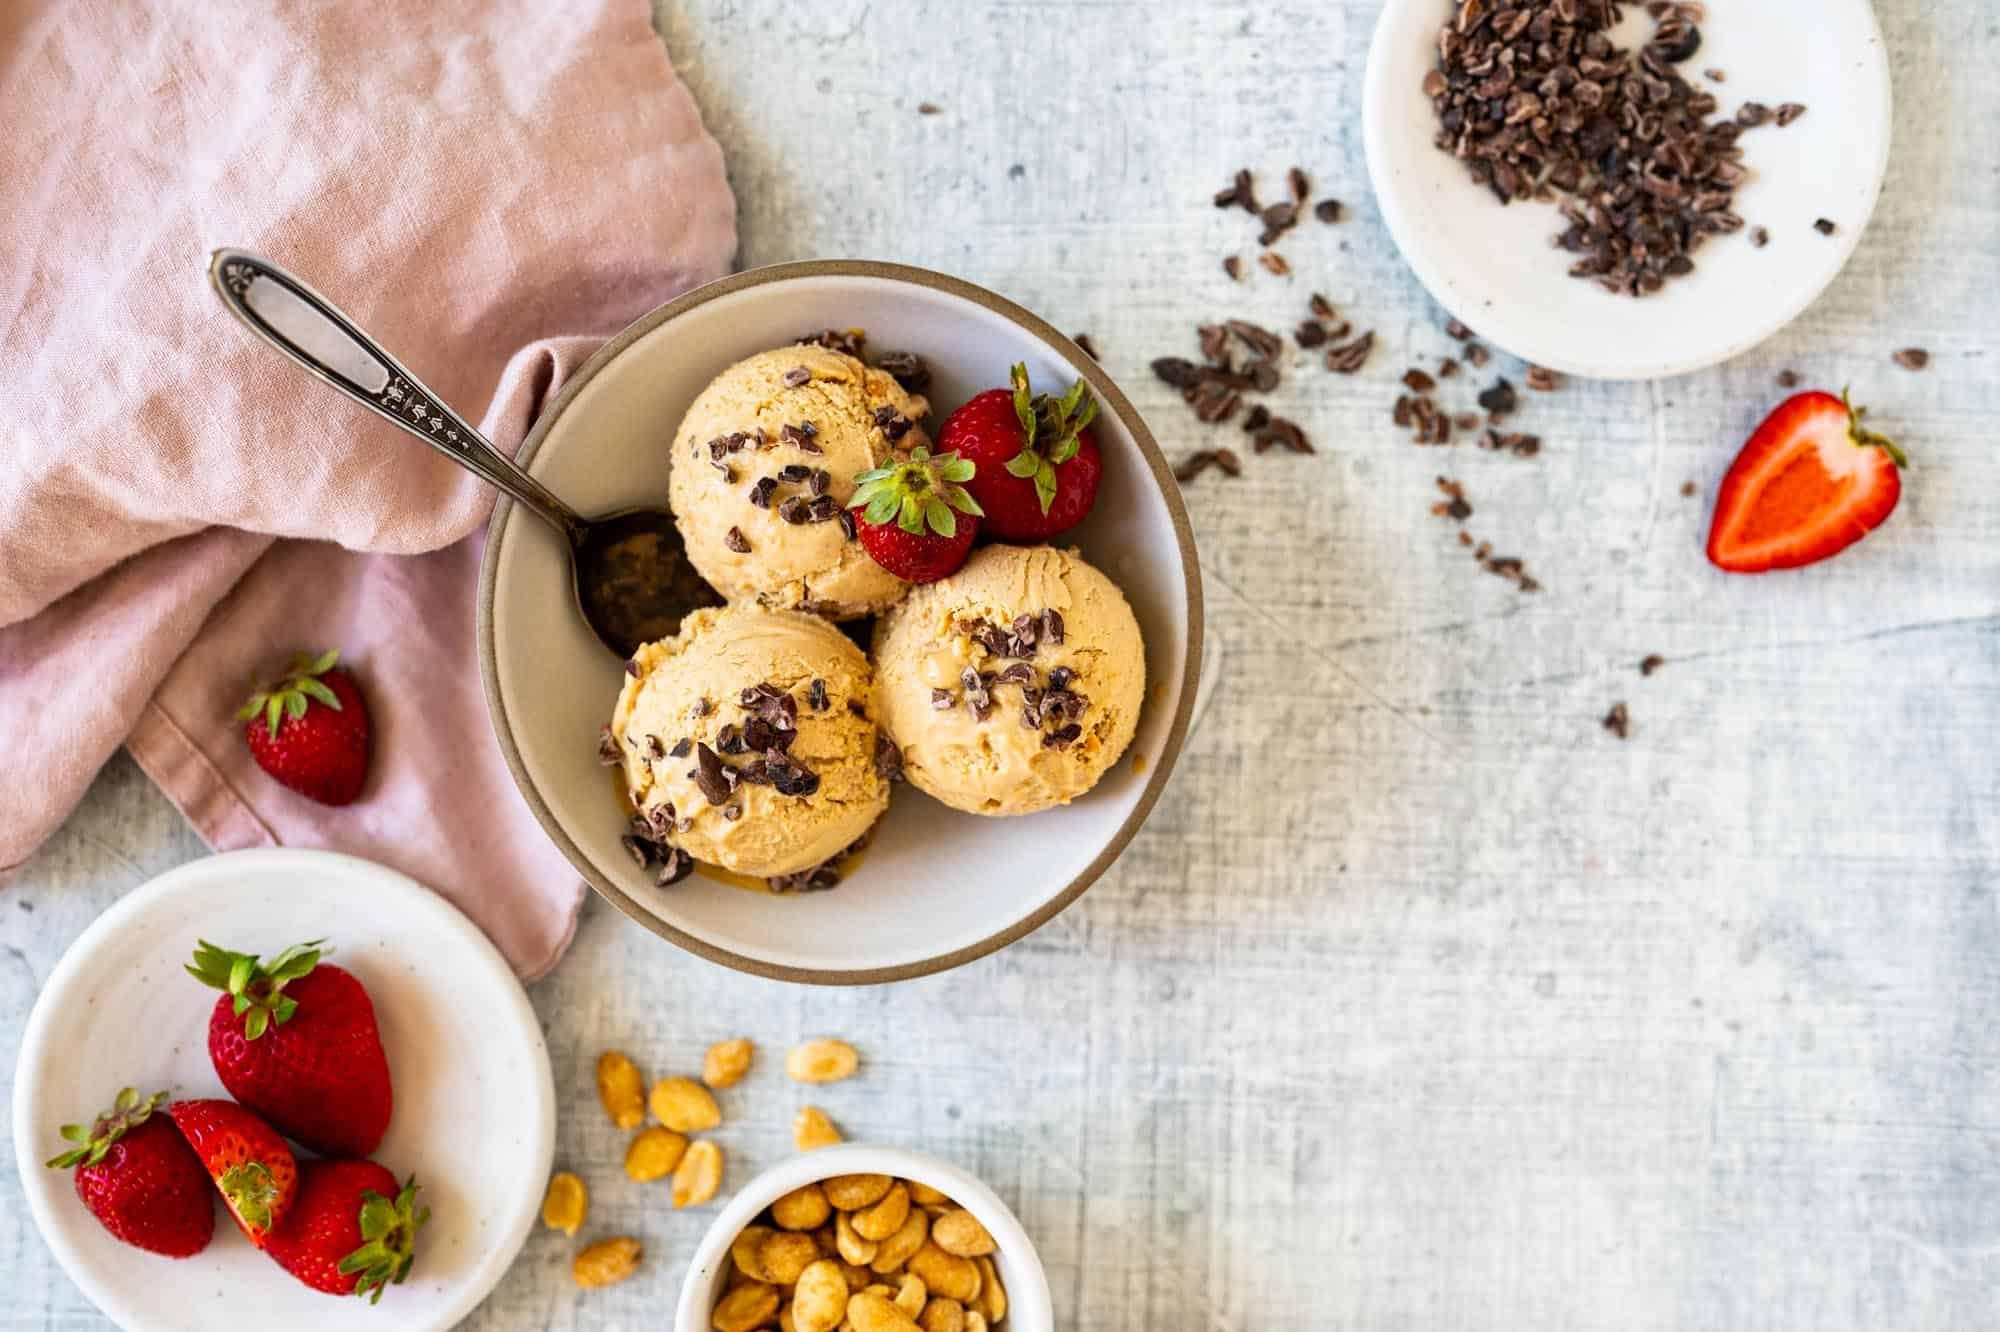 Almost Vegan Peanut Butter Ice Cream Recipe via thepigandquill.com #dairyfree #eggfree #plantbased